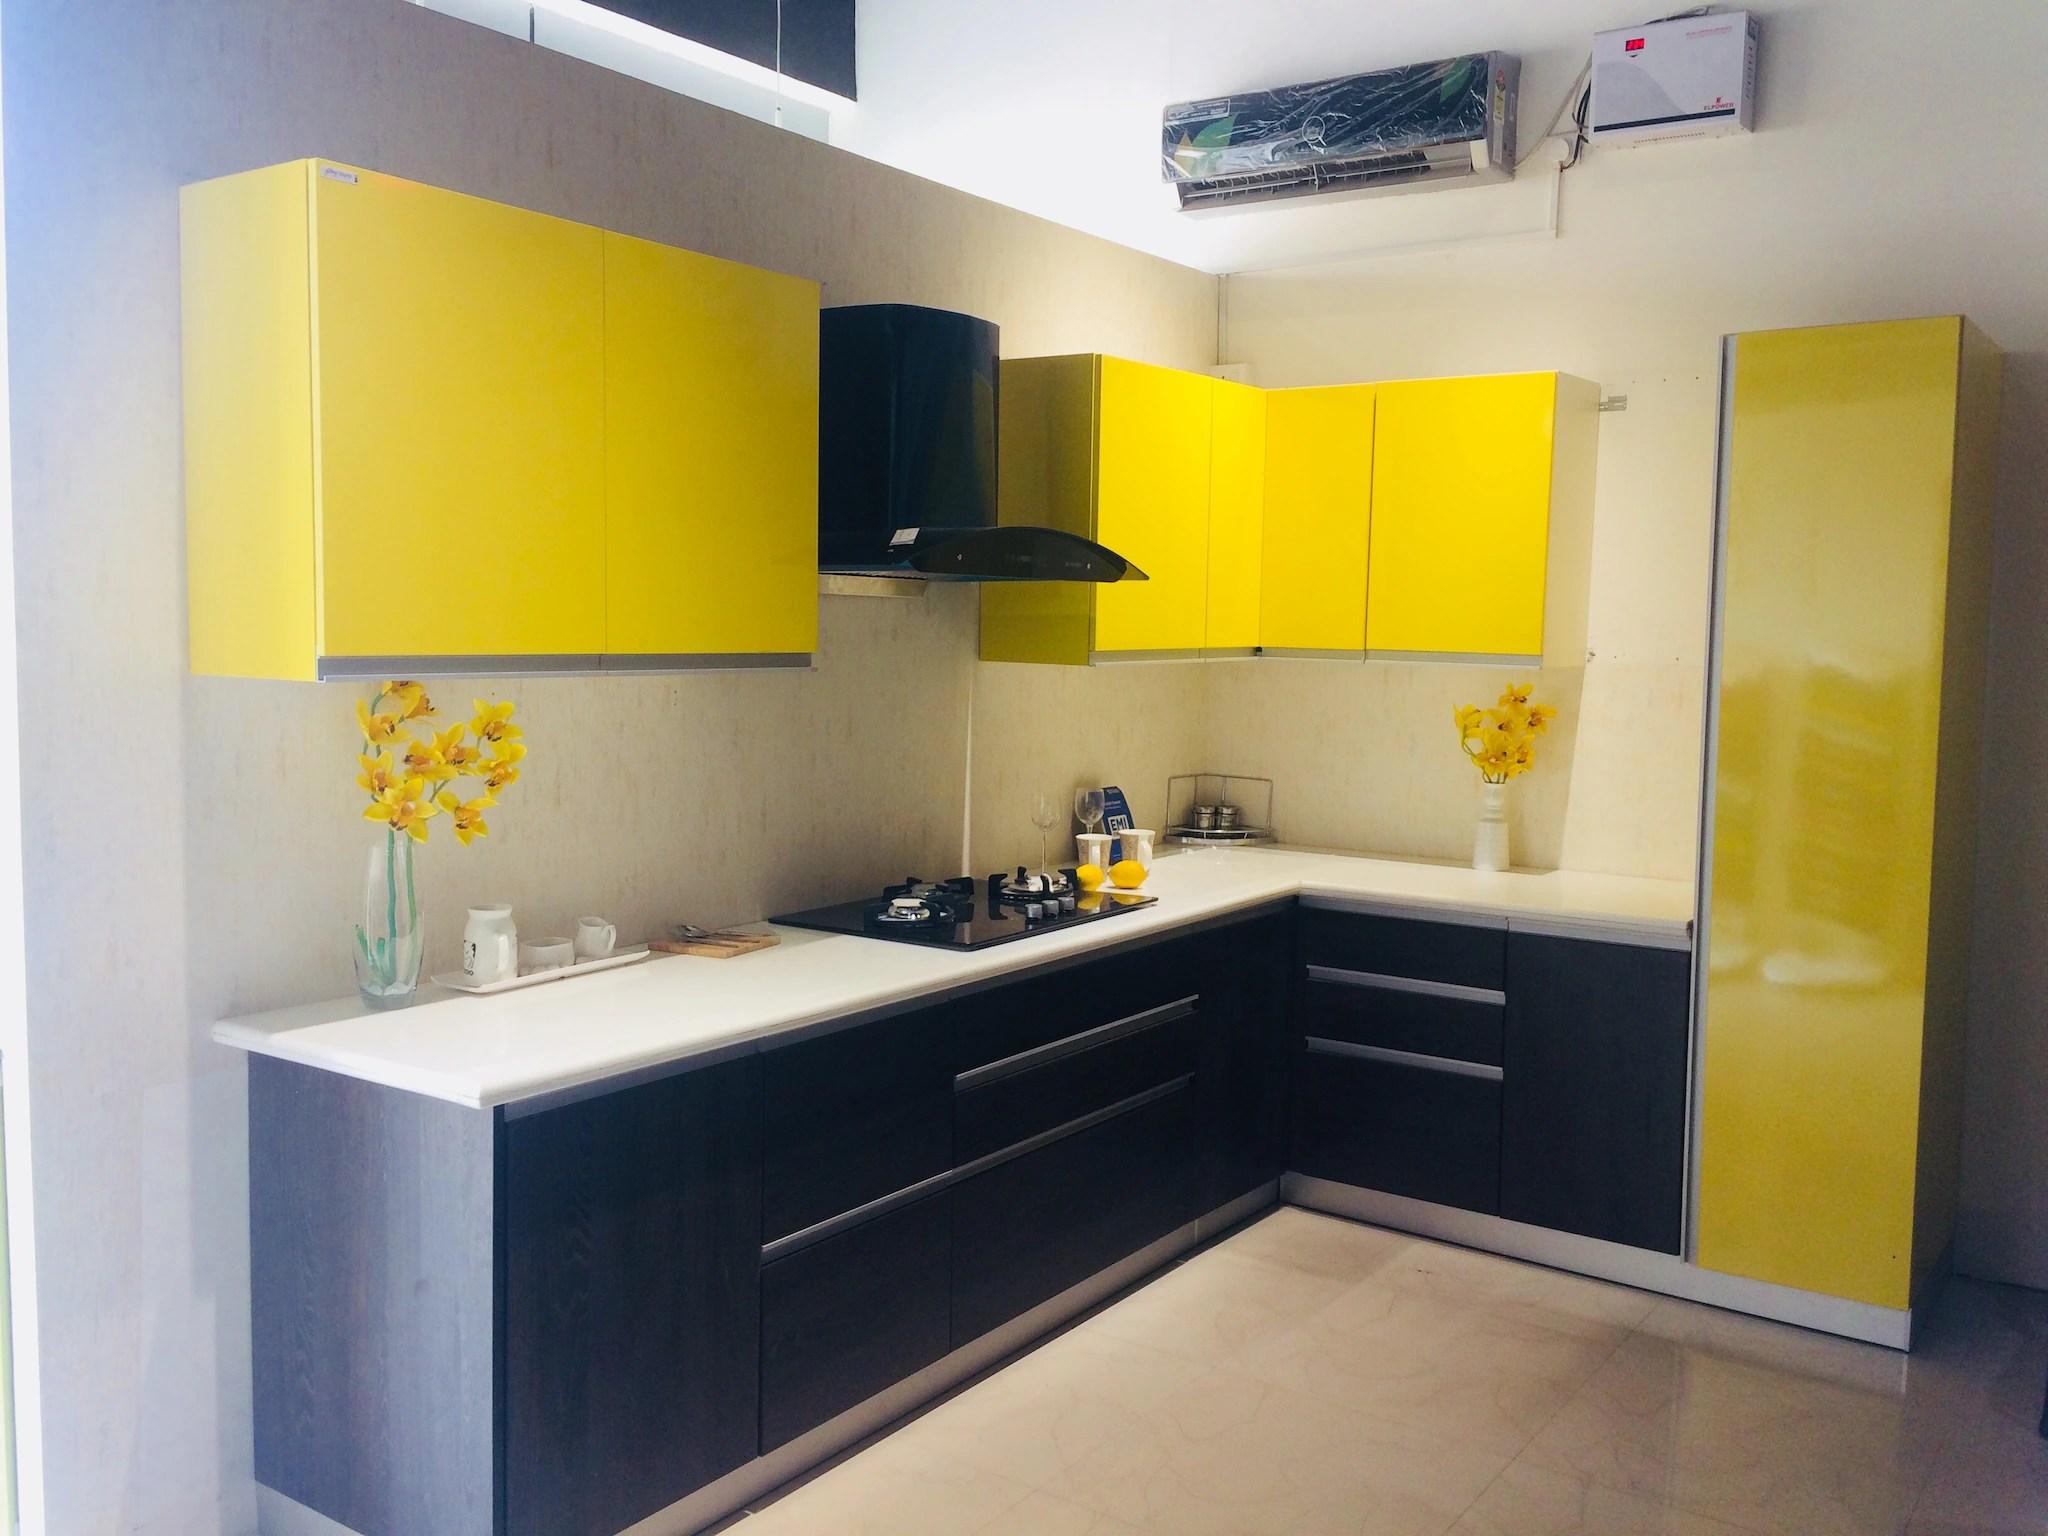 modular kitchen ninja system pulse blender top 9 dealers in sahid nagar best bhubaneshwar